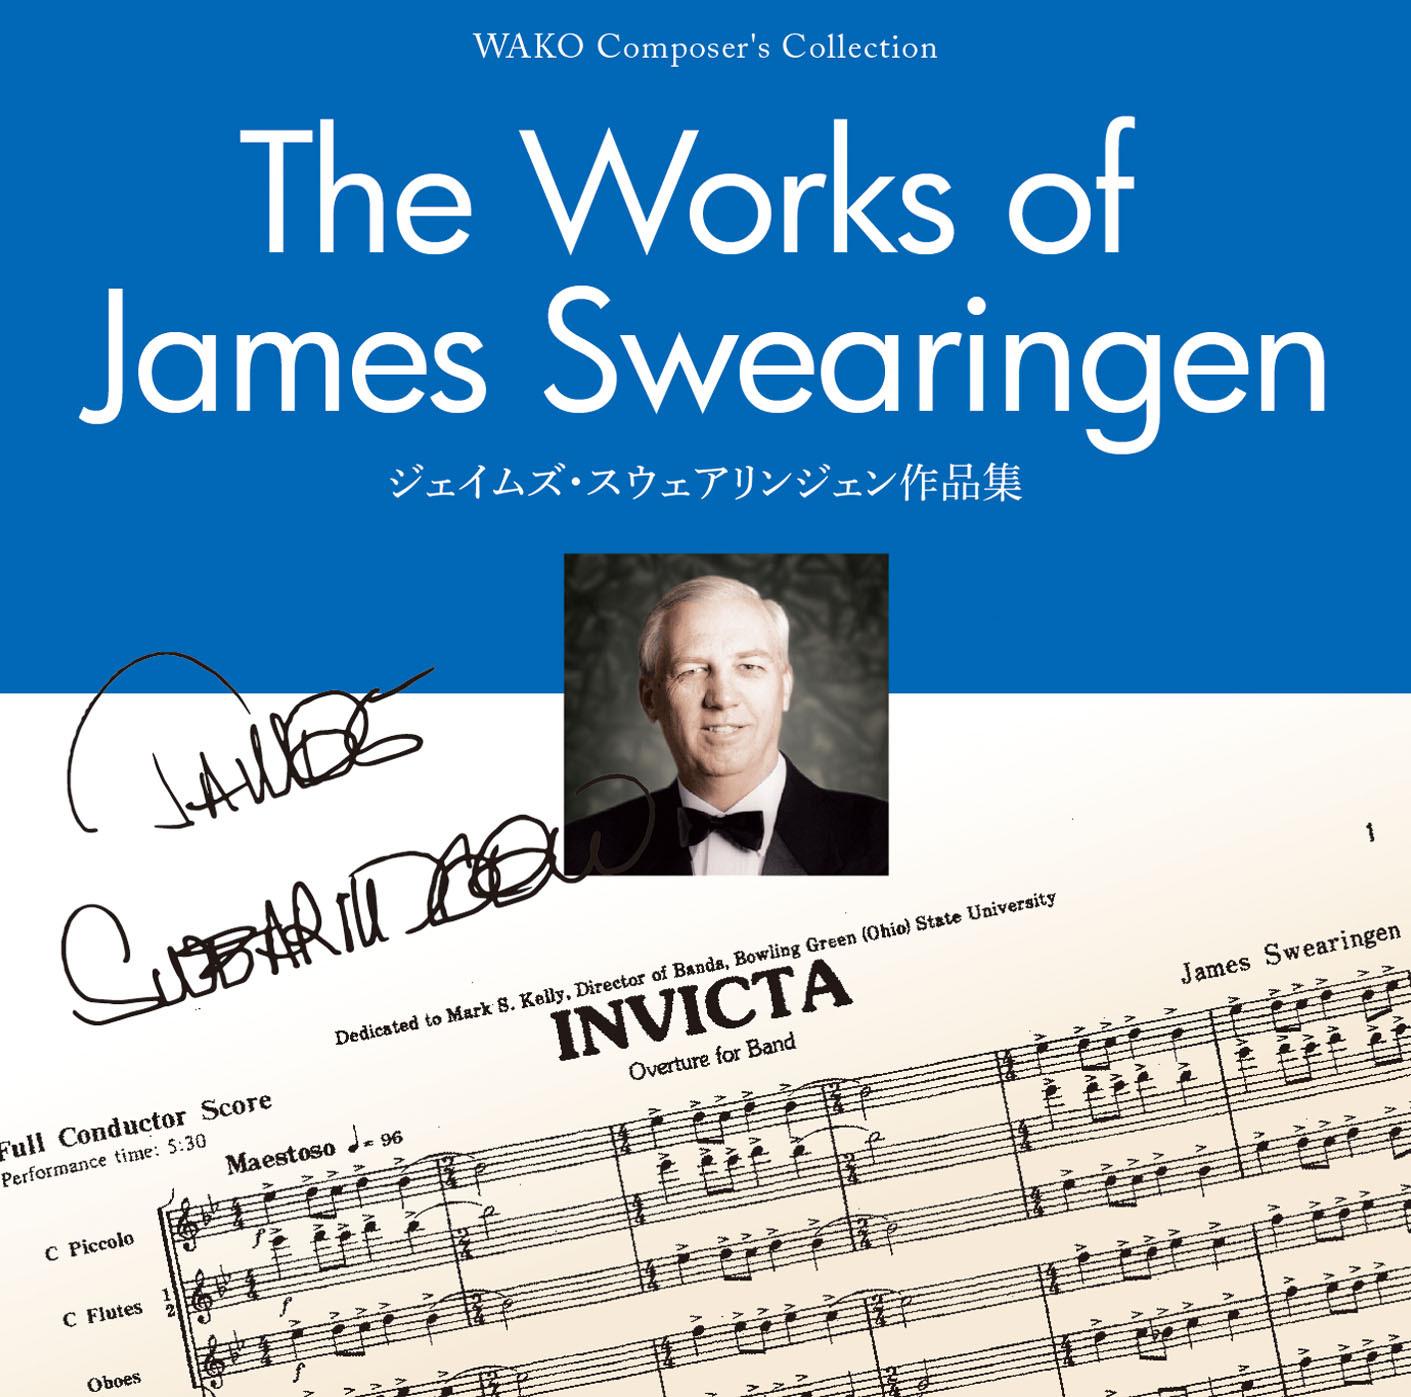 Wako Composer's Collection The Works of James Swearingen ジェイムズ・スウェアリンジェン作品集(WKCD-0201)